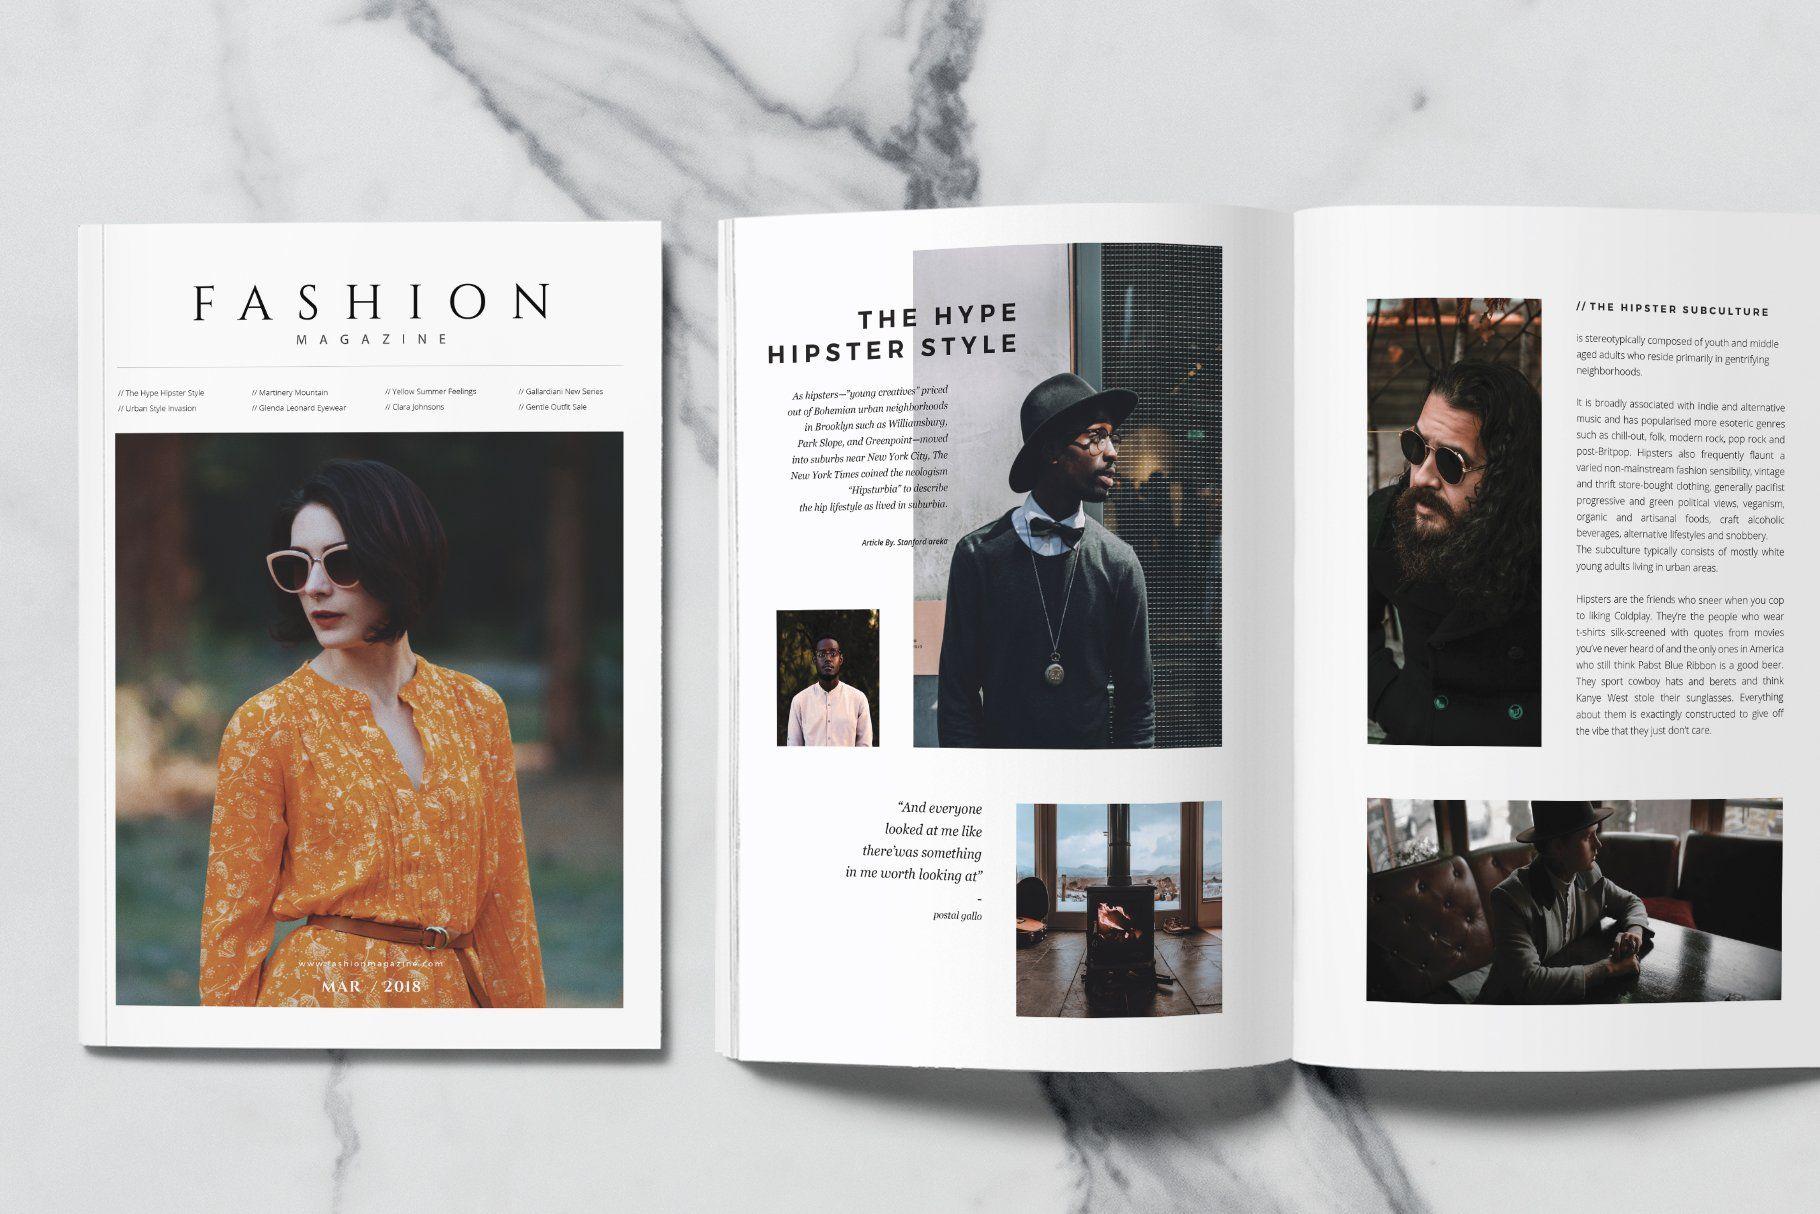 Fashion and Pregnancy